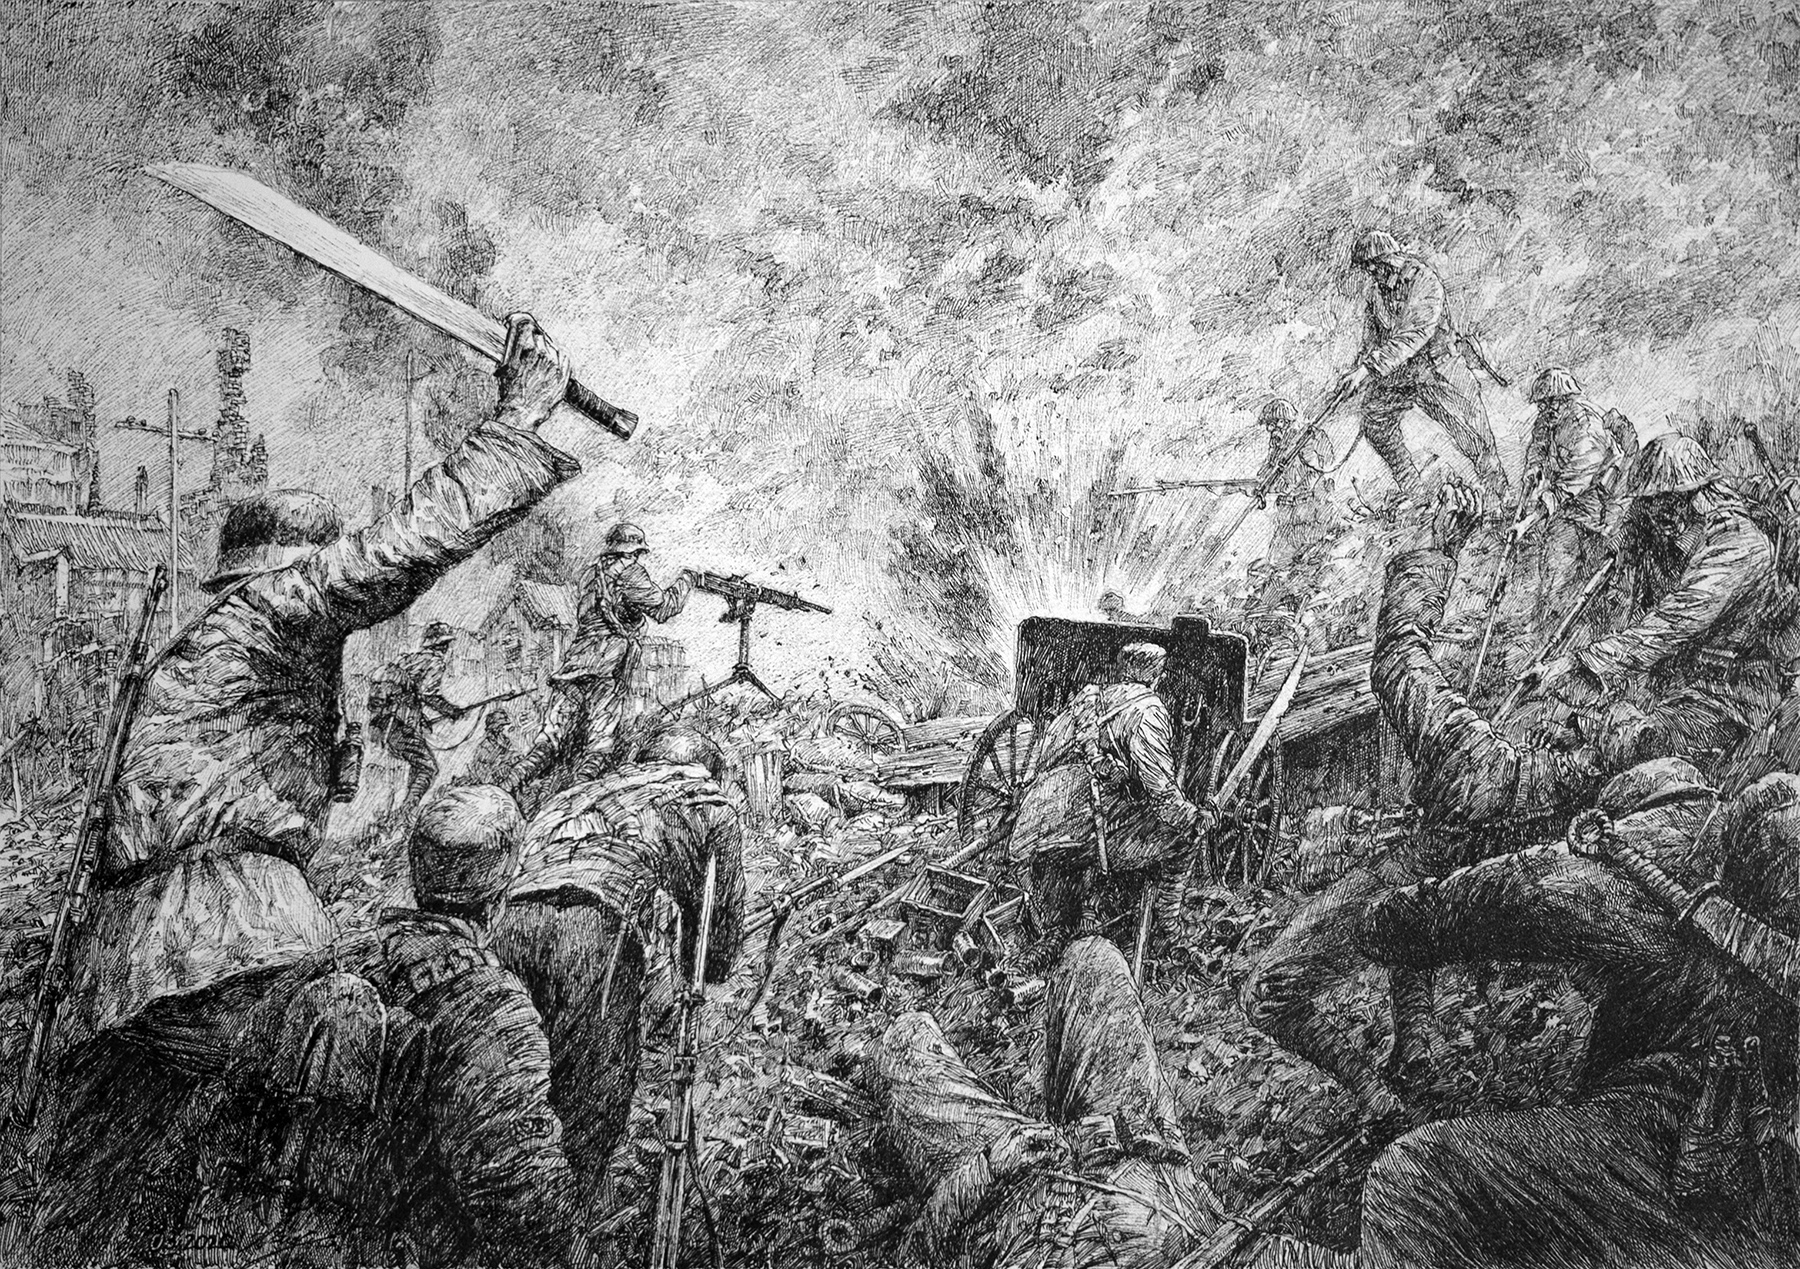 Songhu Battle 1937